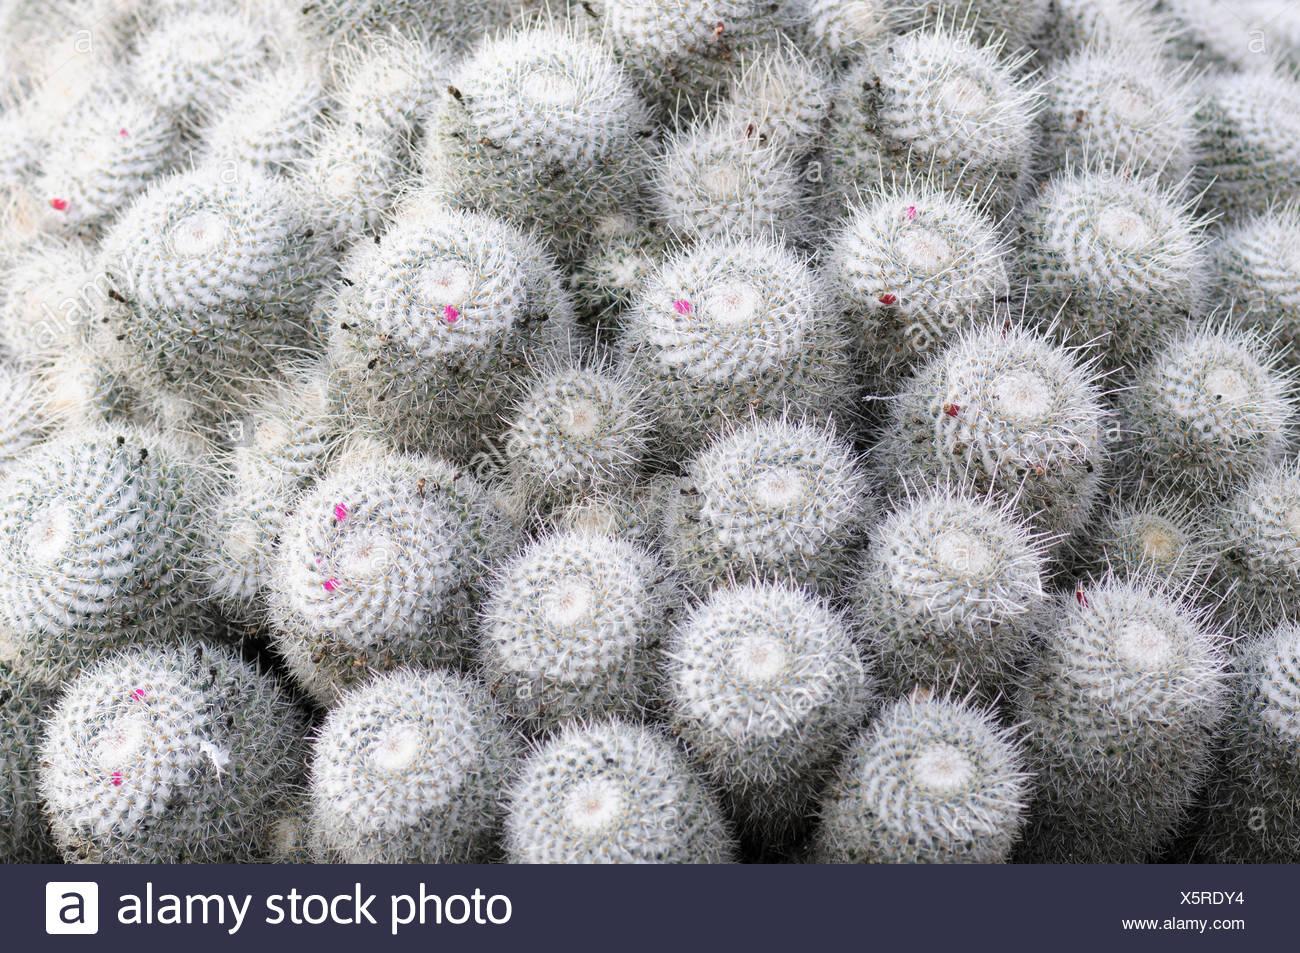 Cactus pincushion cactus mammillaria mammillaria bombycina cactus pincushion cactus mammillaria mammillaria bombycina beauty in nature cactus colour desert plant evergreen spring flowering summer flowering mightylinksfo